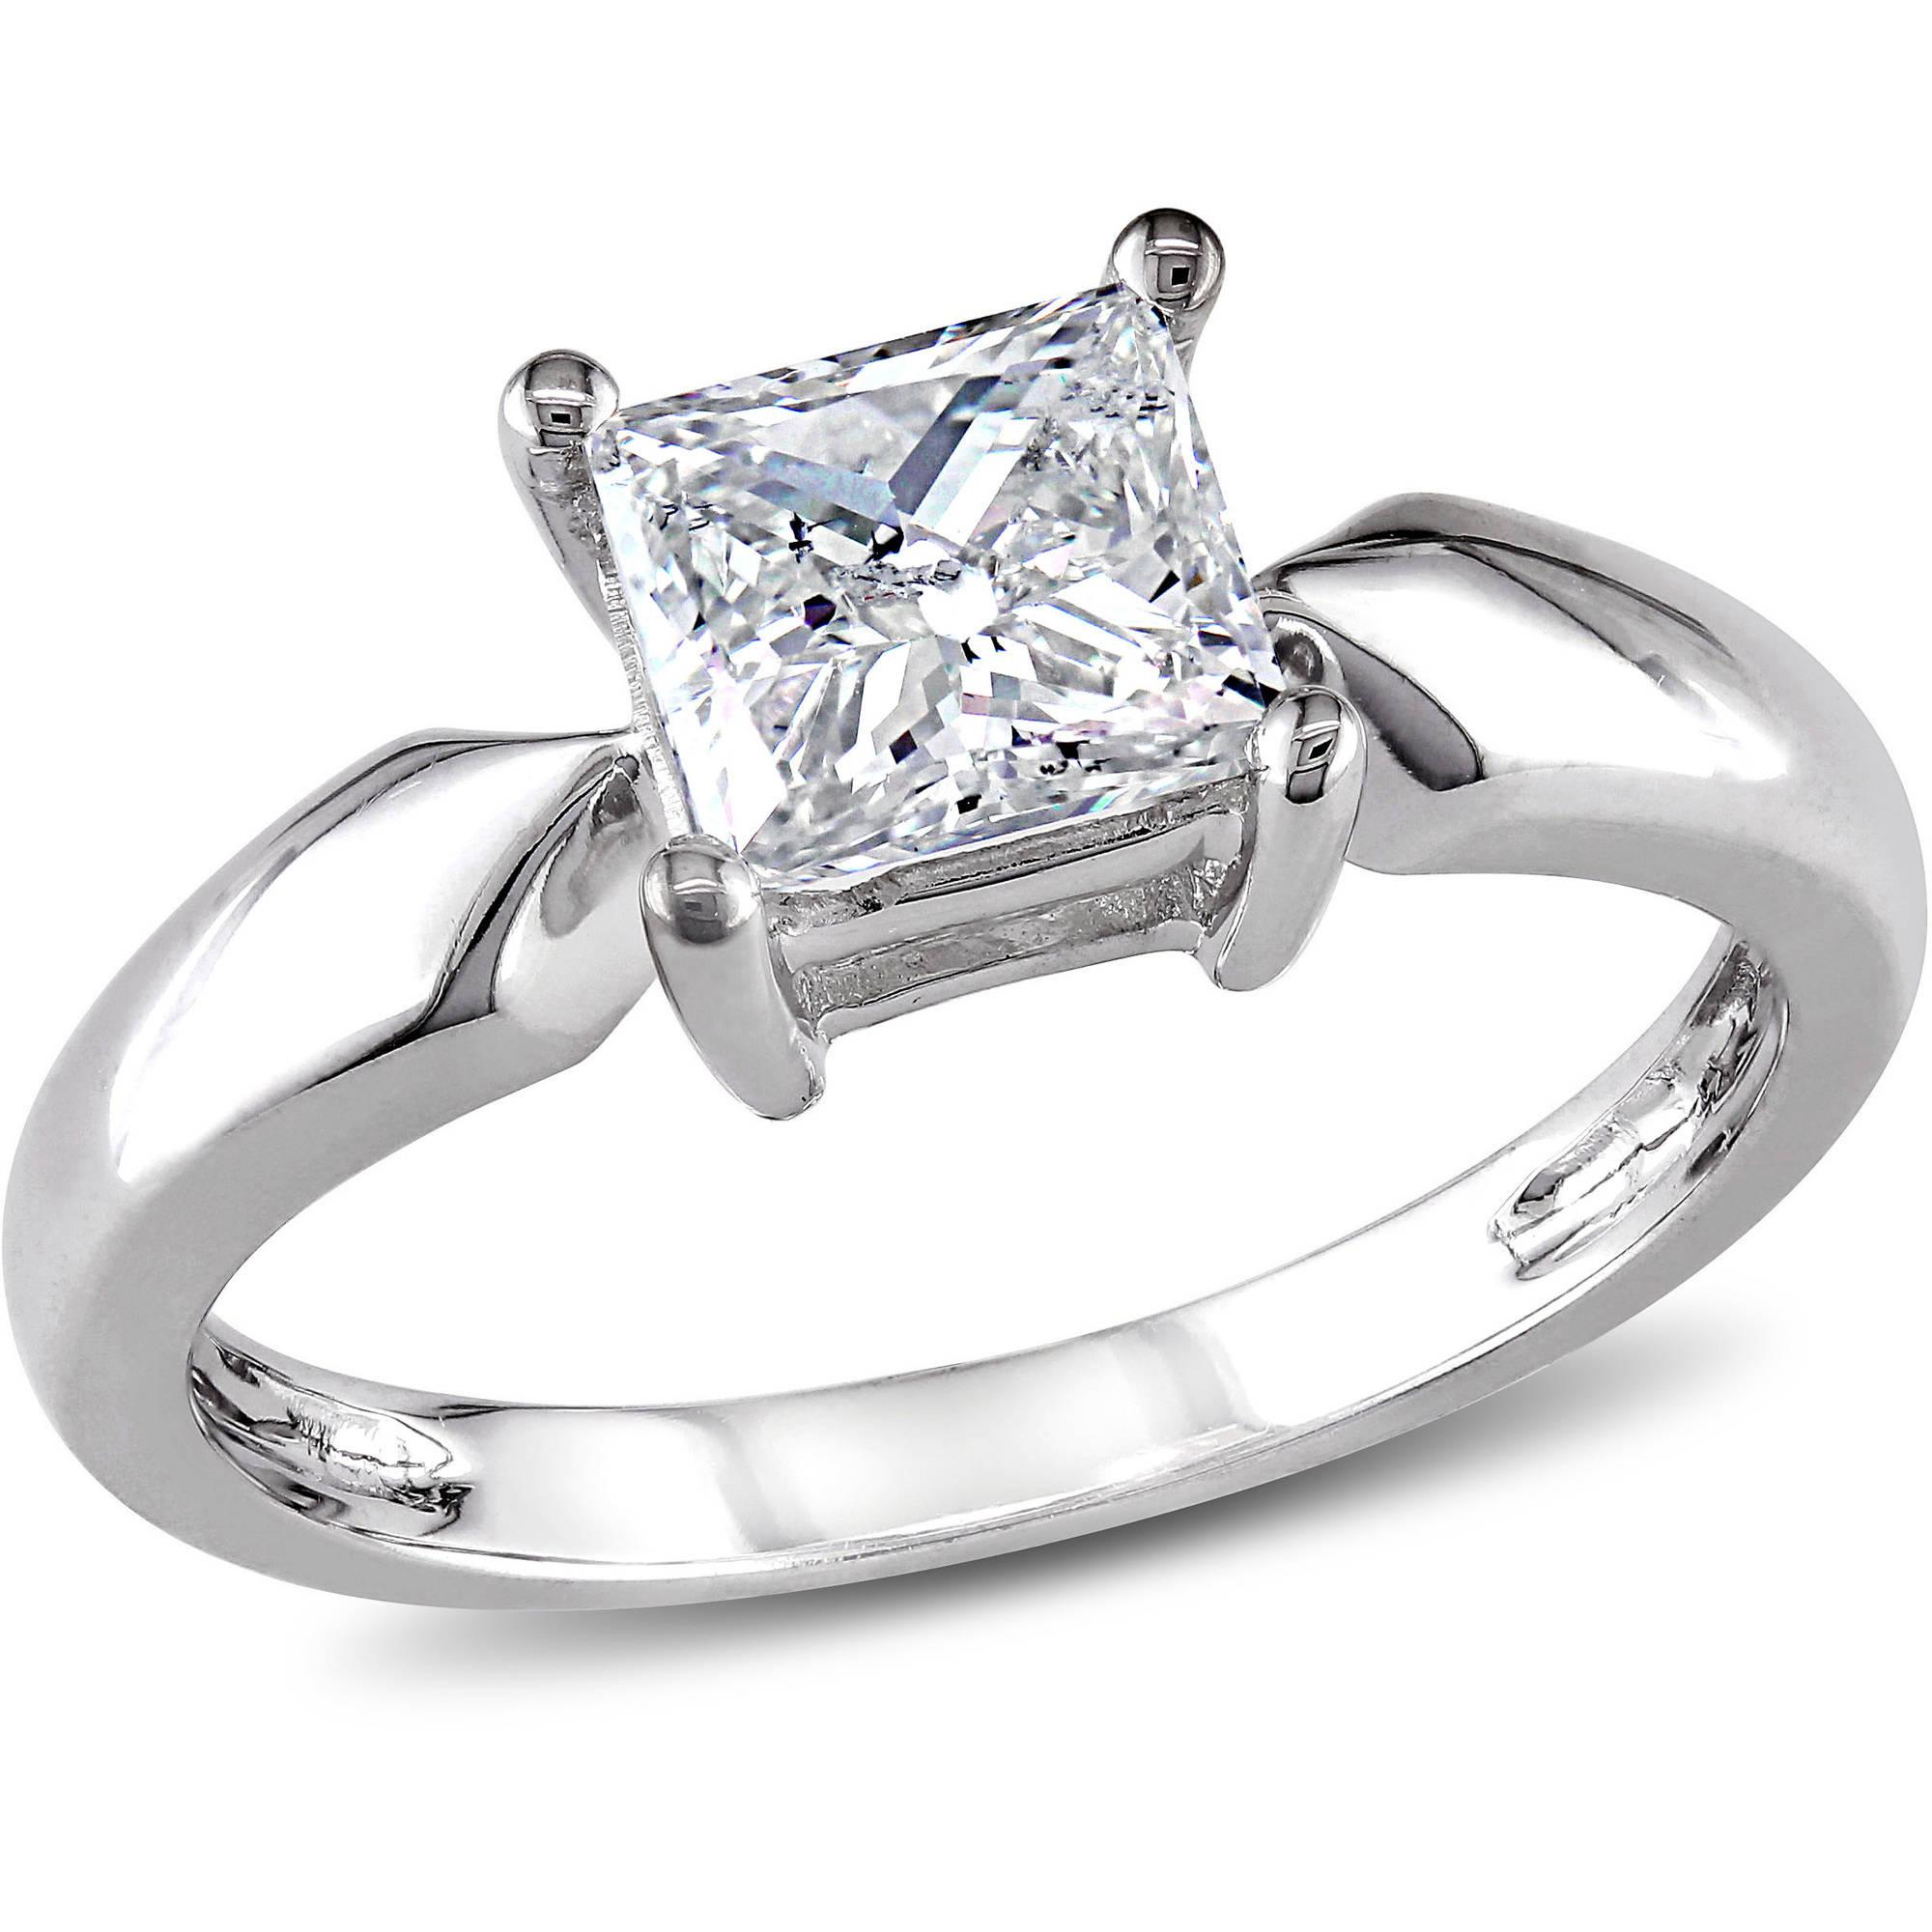 Miabella 1 Carat T.W. Princess Cut Diamond Solitaire Ring in 14kt White Gold